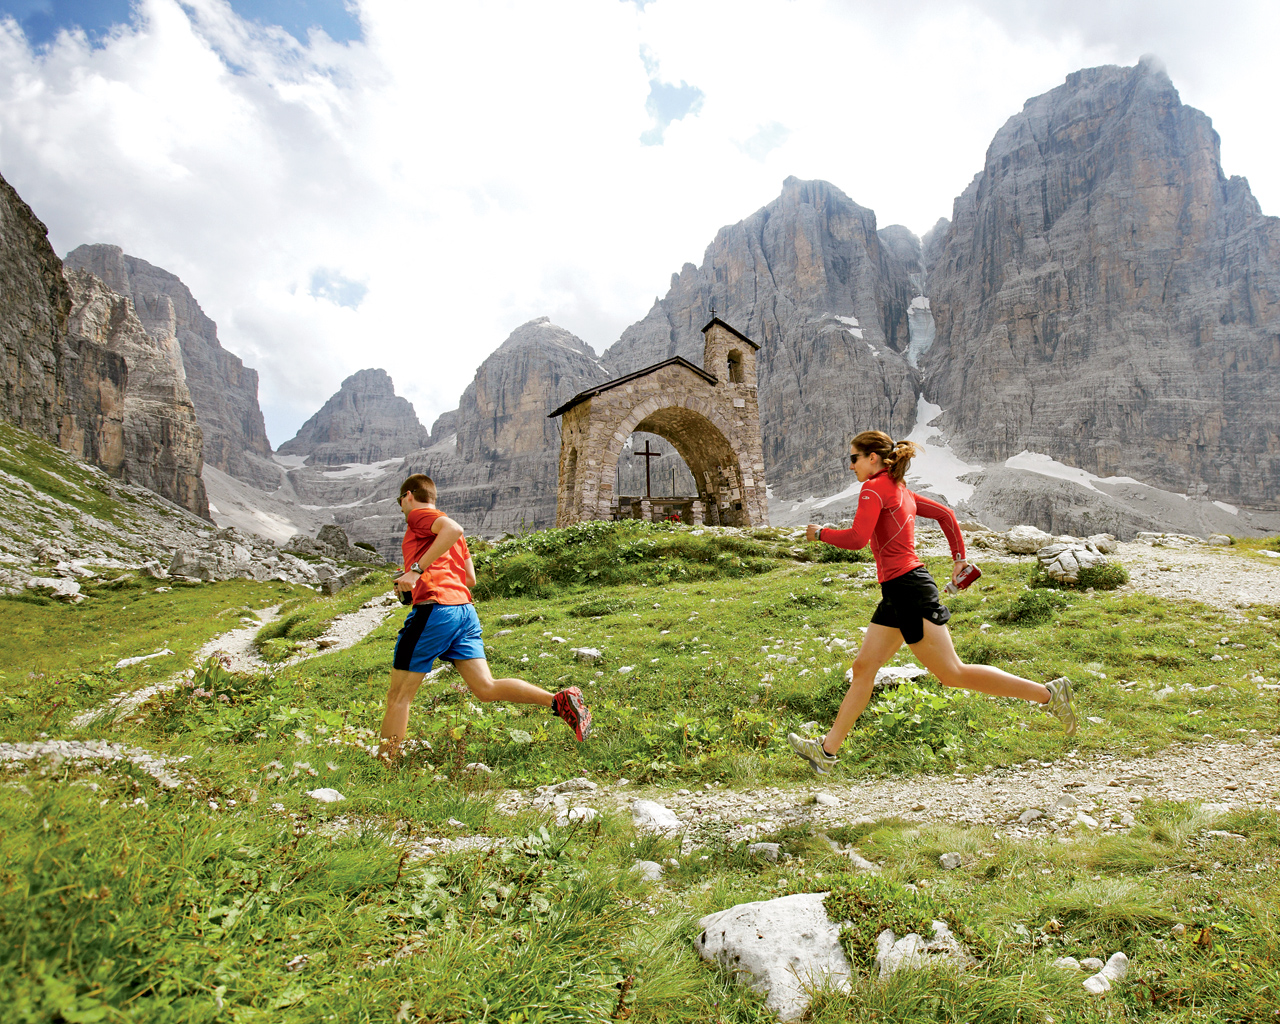 Rave Run Brenta Dolomites Italy Runners World 1280x1024